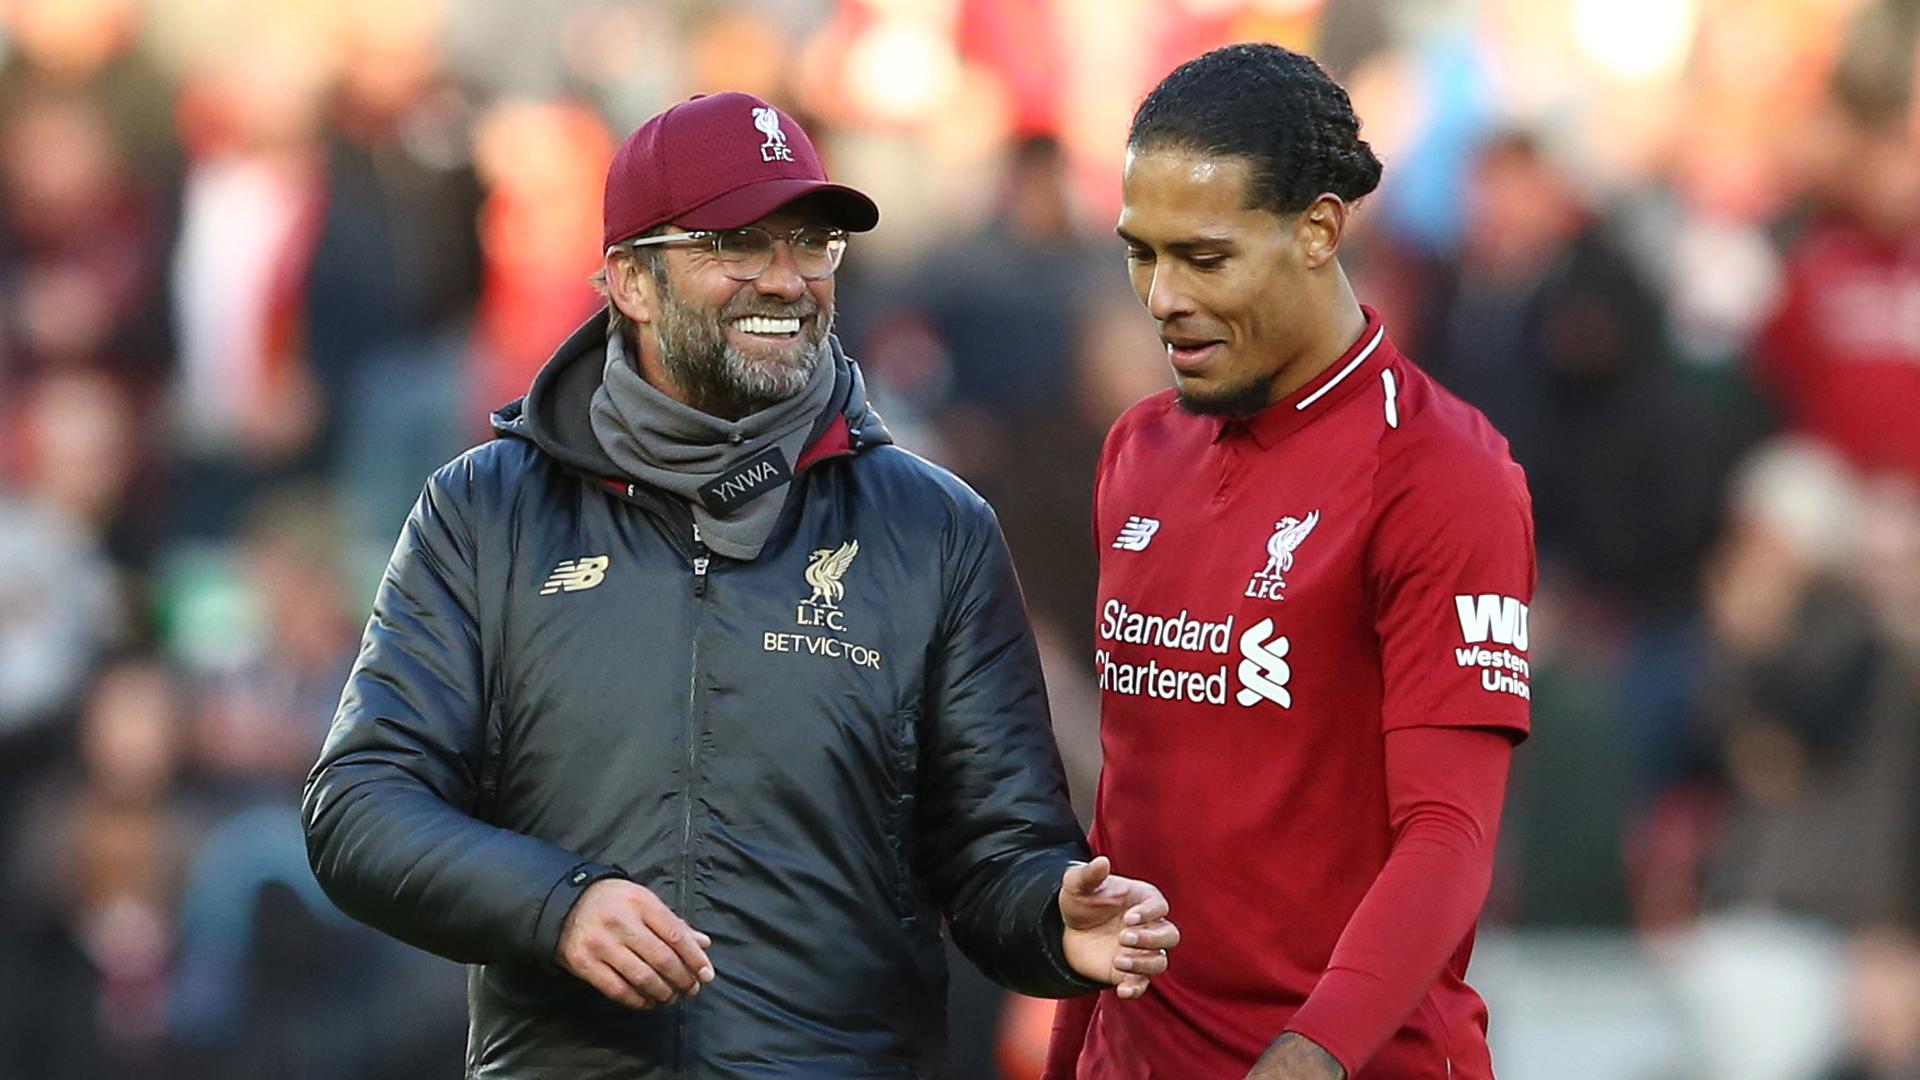 Klopp offers insight into Liverpool's successful pursuit of 'world-class' Van Dijk